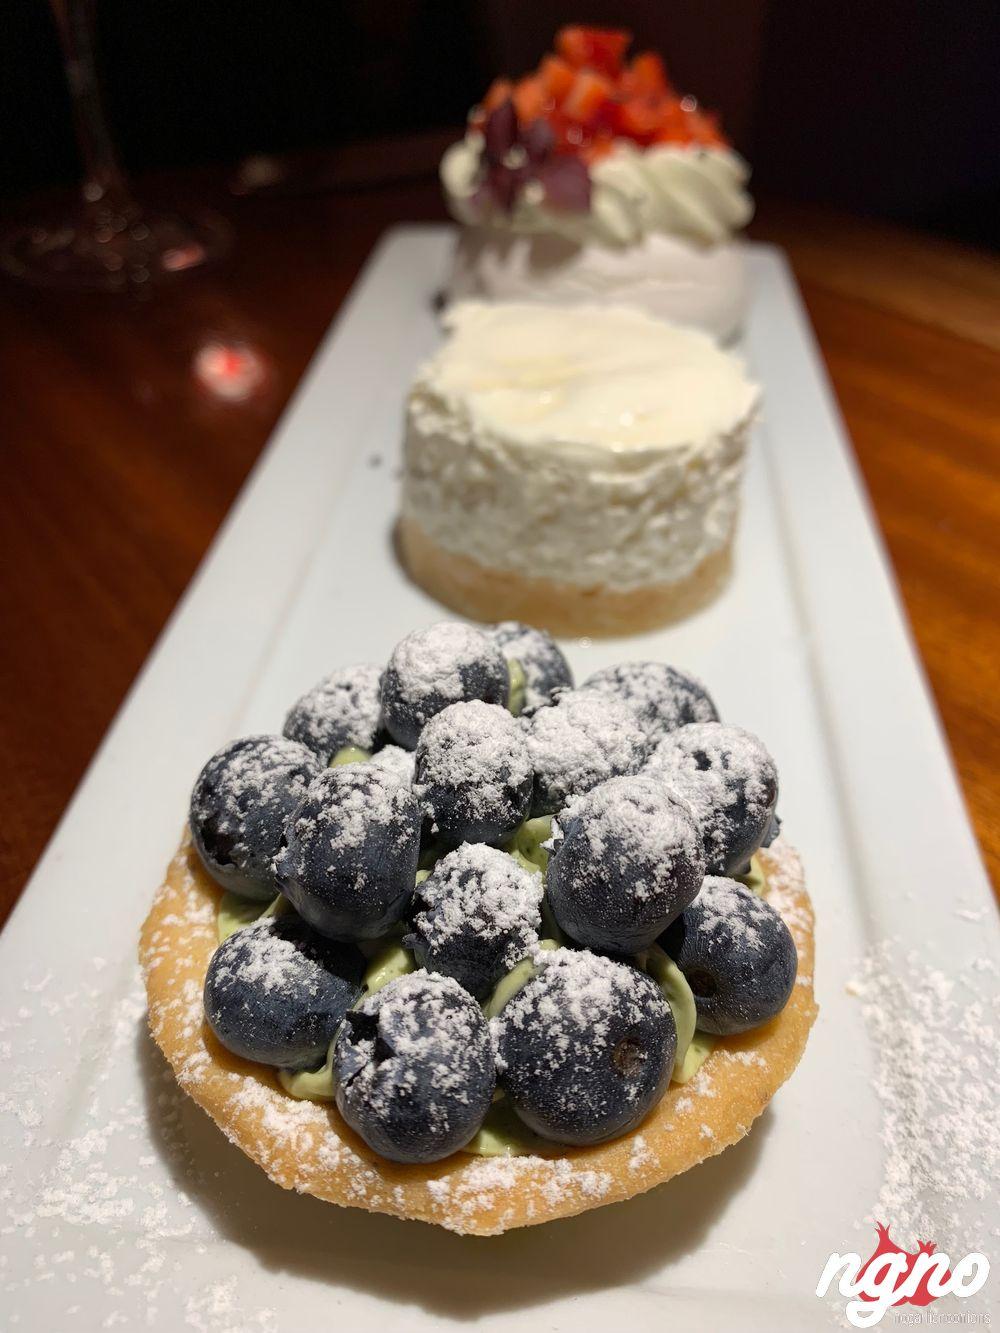 blueberry-maki-sushi-paris-nogarlicnoonions-82018-10-13-05-58-08